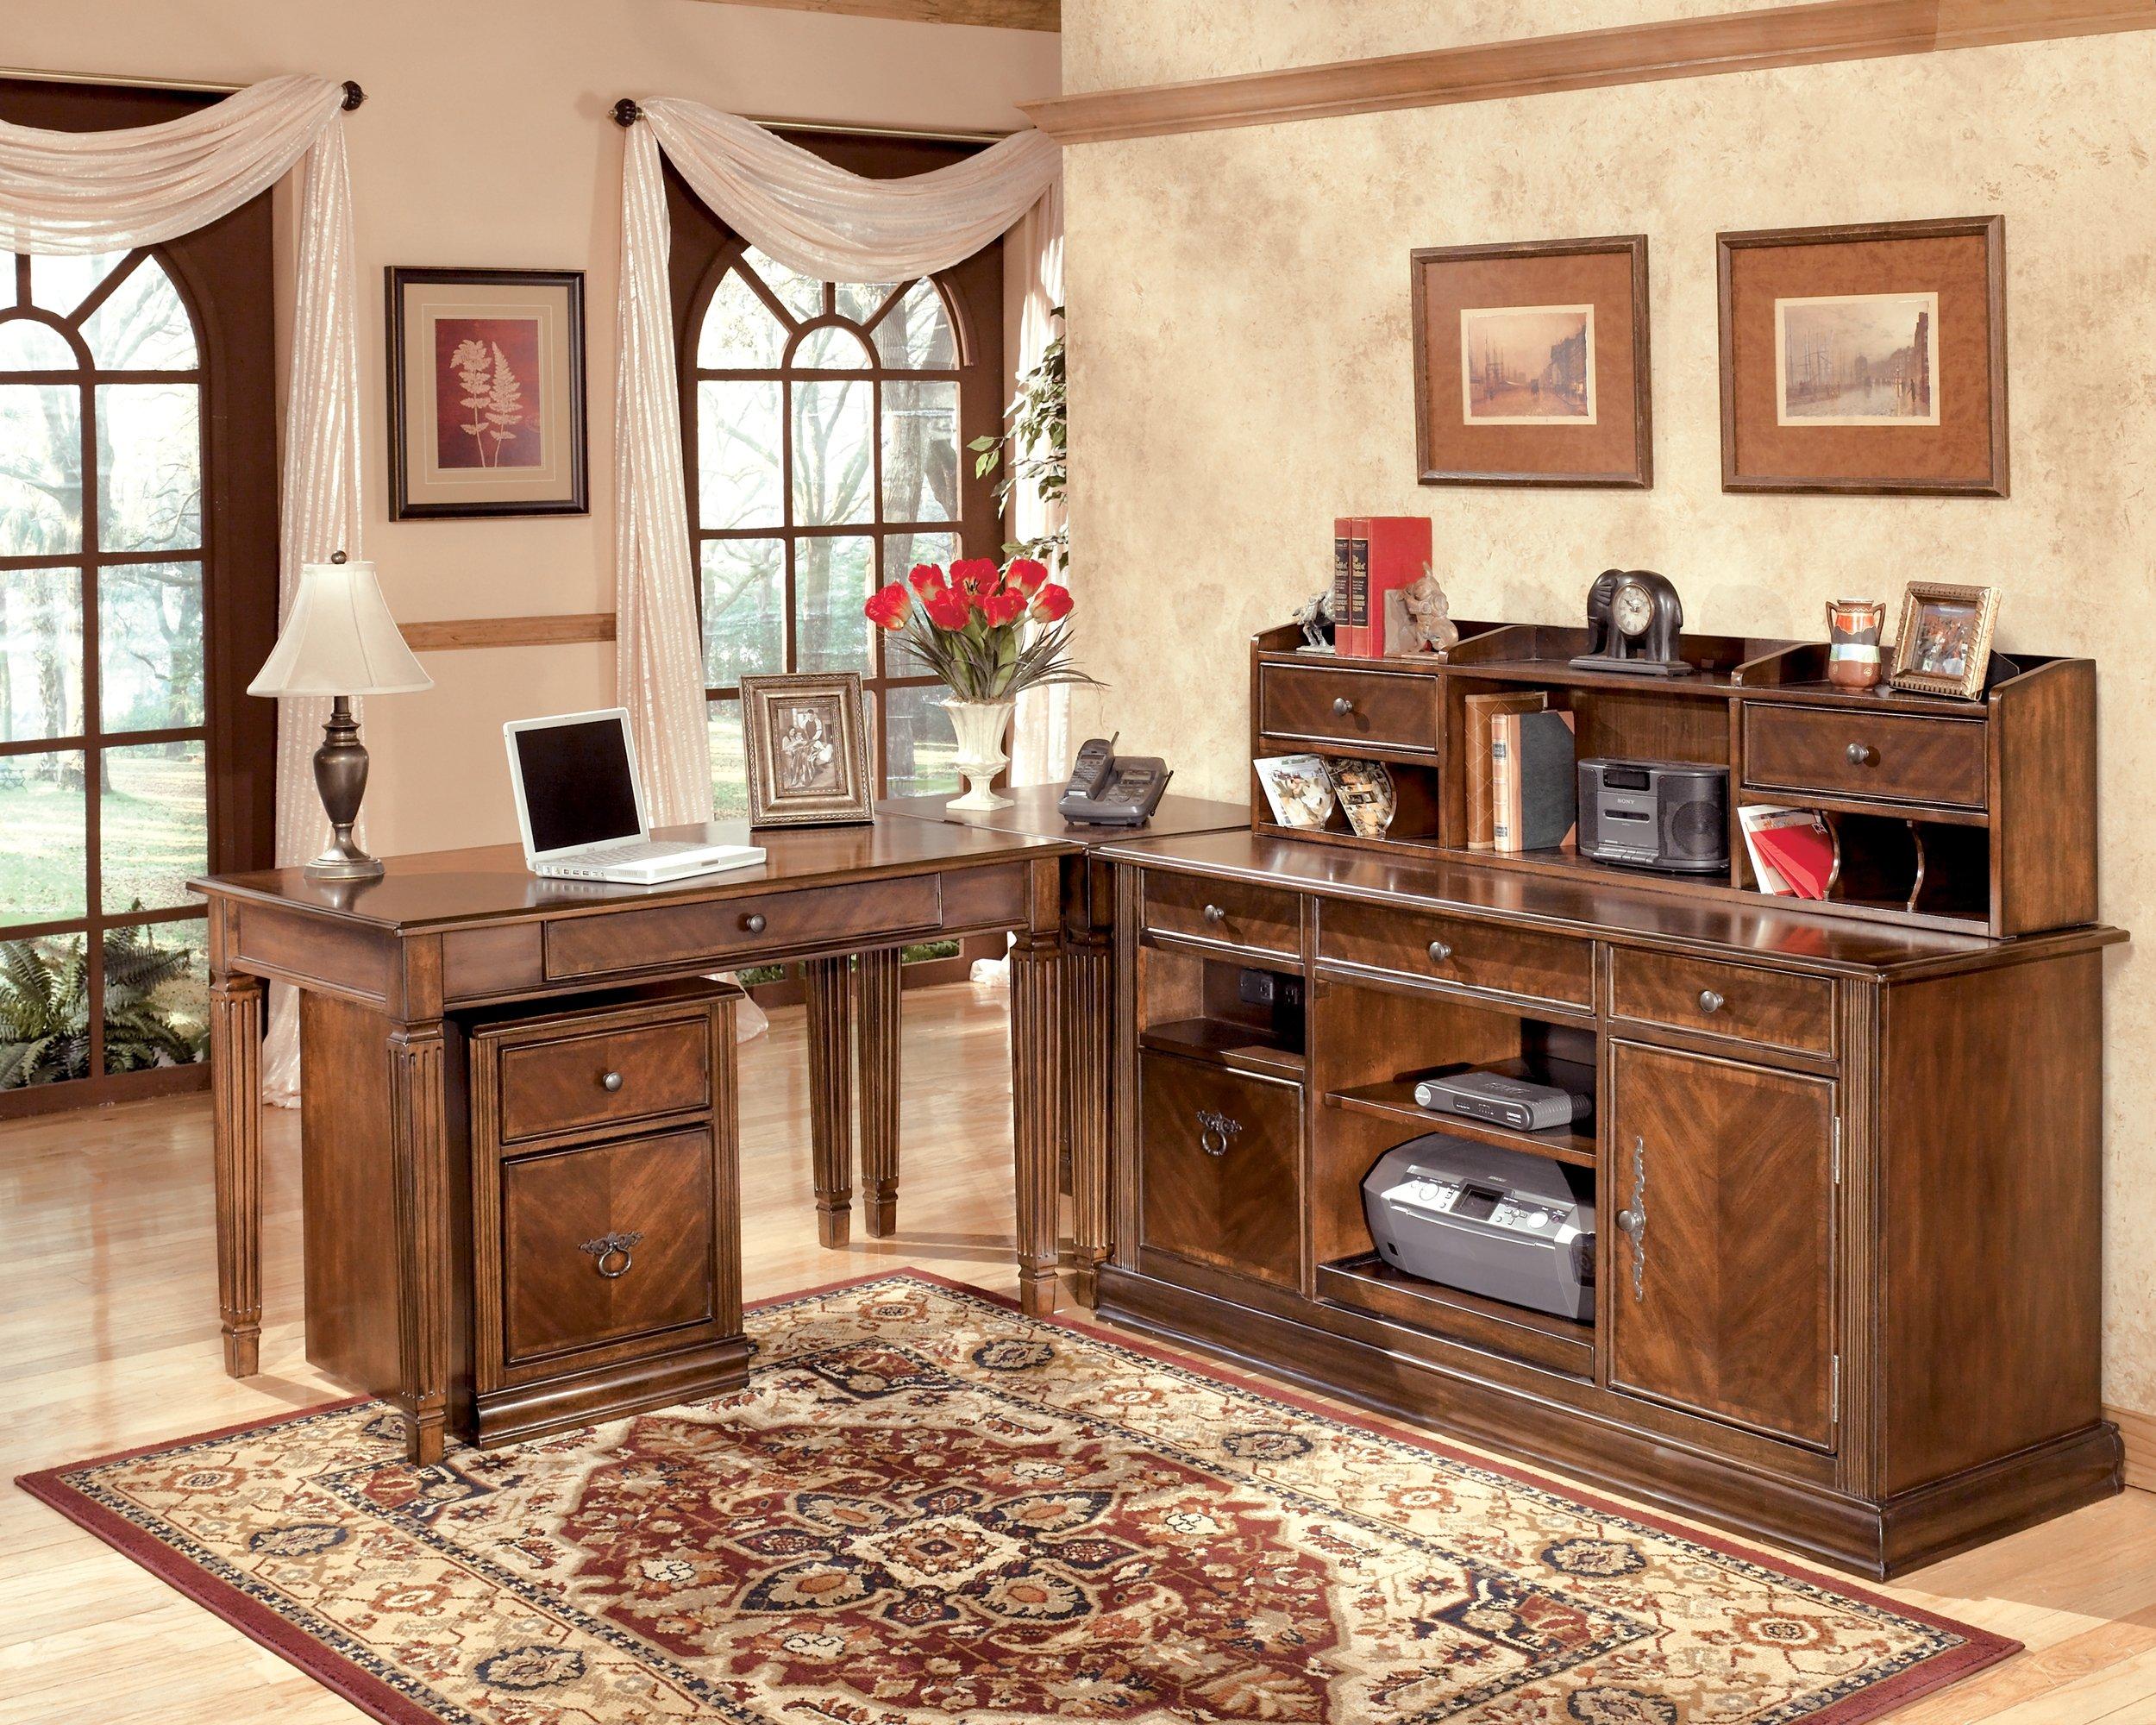 Ashley Furniture Signature Design - Hamlyn File Cabinet - 1 Drawer/1 File Drawer - Traditional - Medium Brown Finish